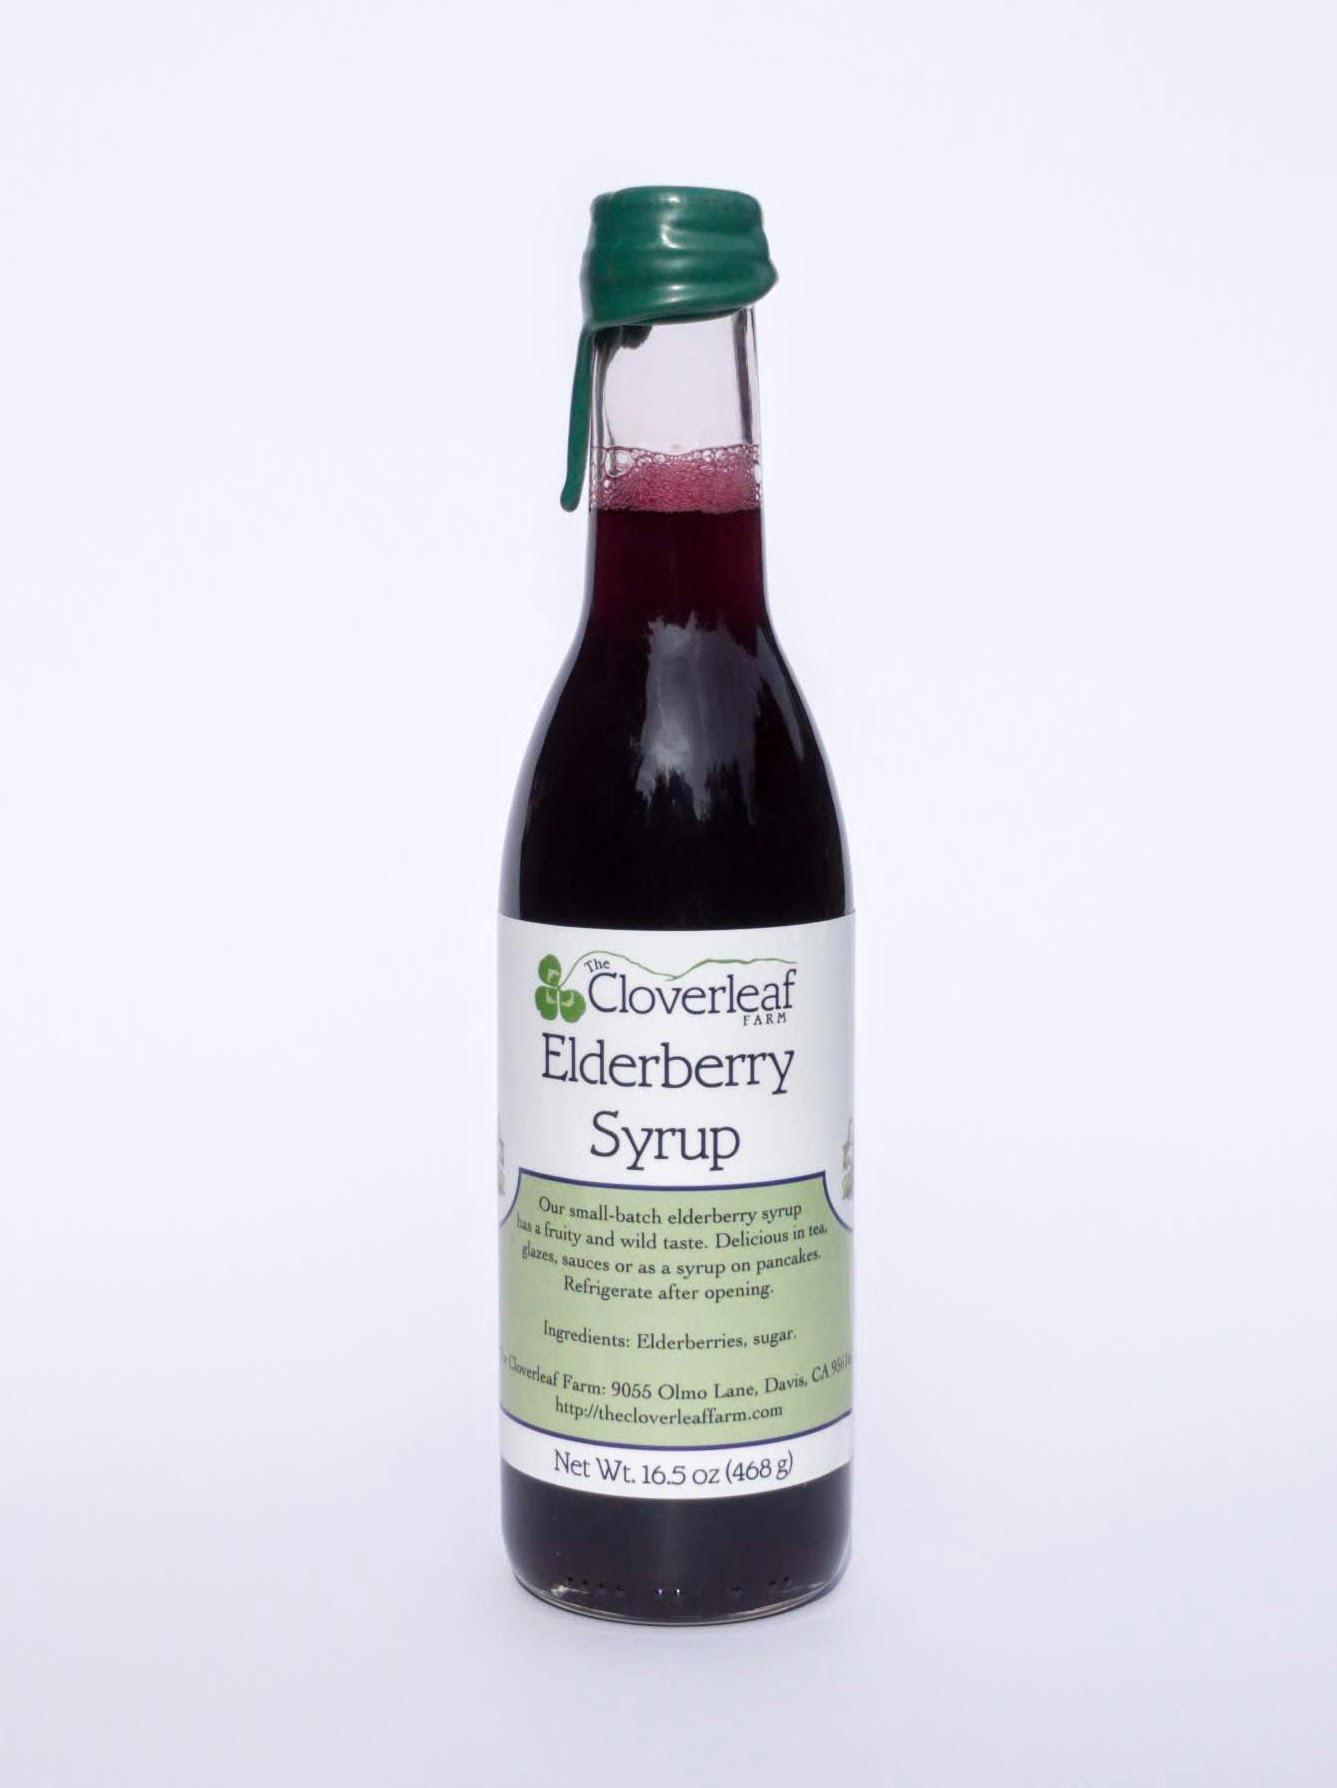 elderberry syrup. 16.5 oz